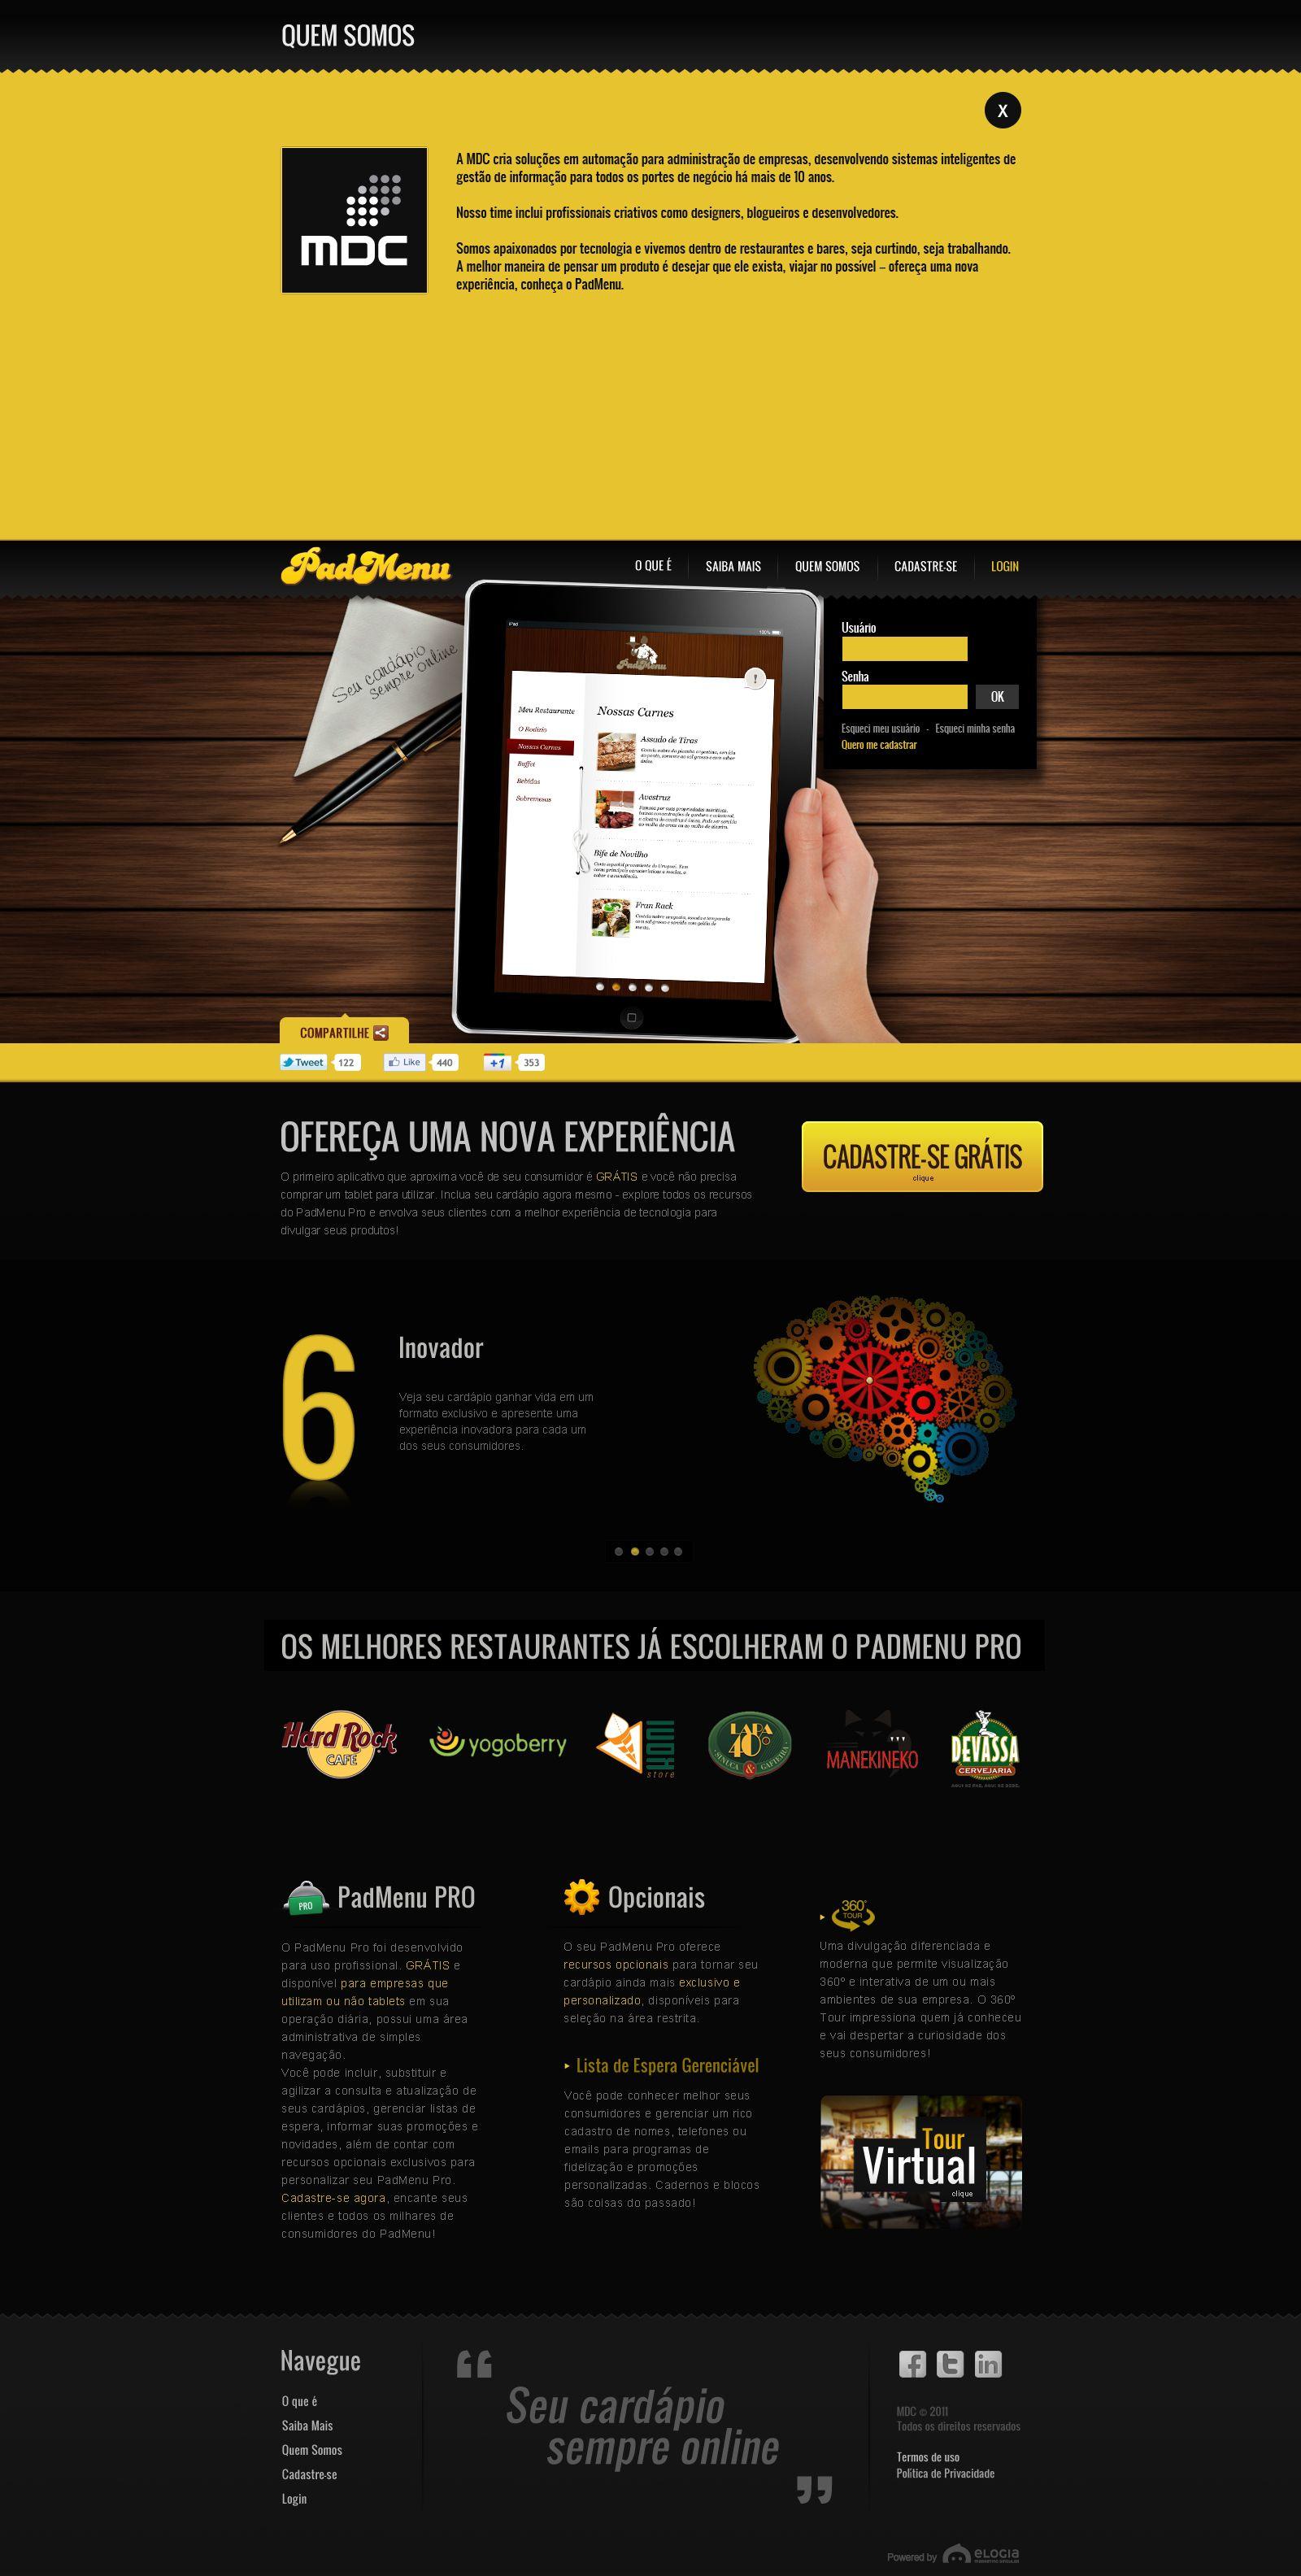 Web Design Site Css Jquery Awards Html Artwebrio Layout Web Gustavogirard Sites Design Artwe Web Design Web Graphic Design Web Development Design